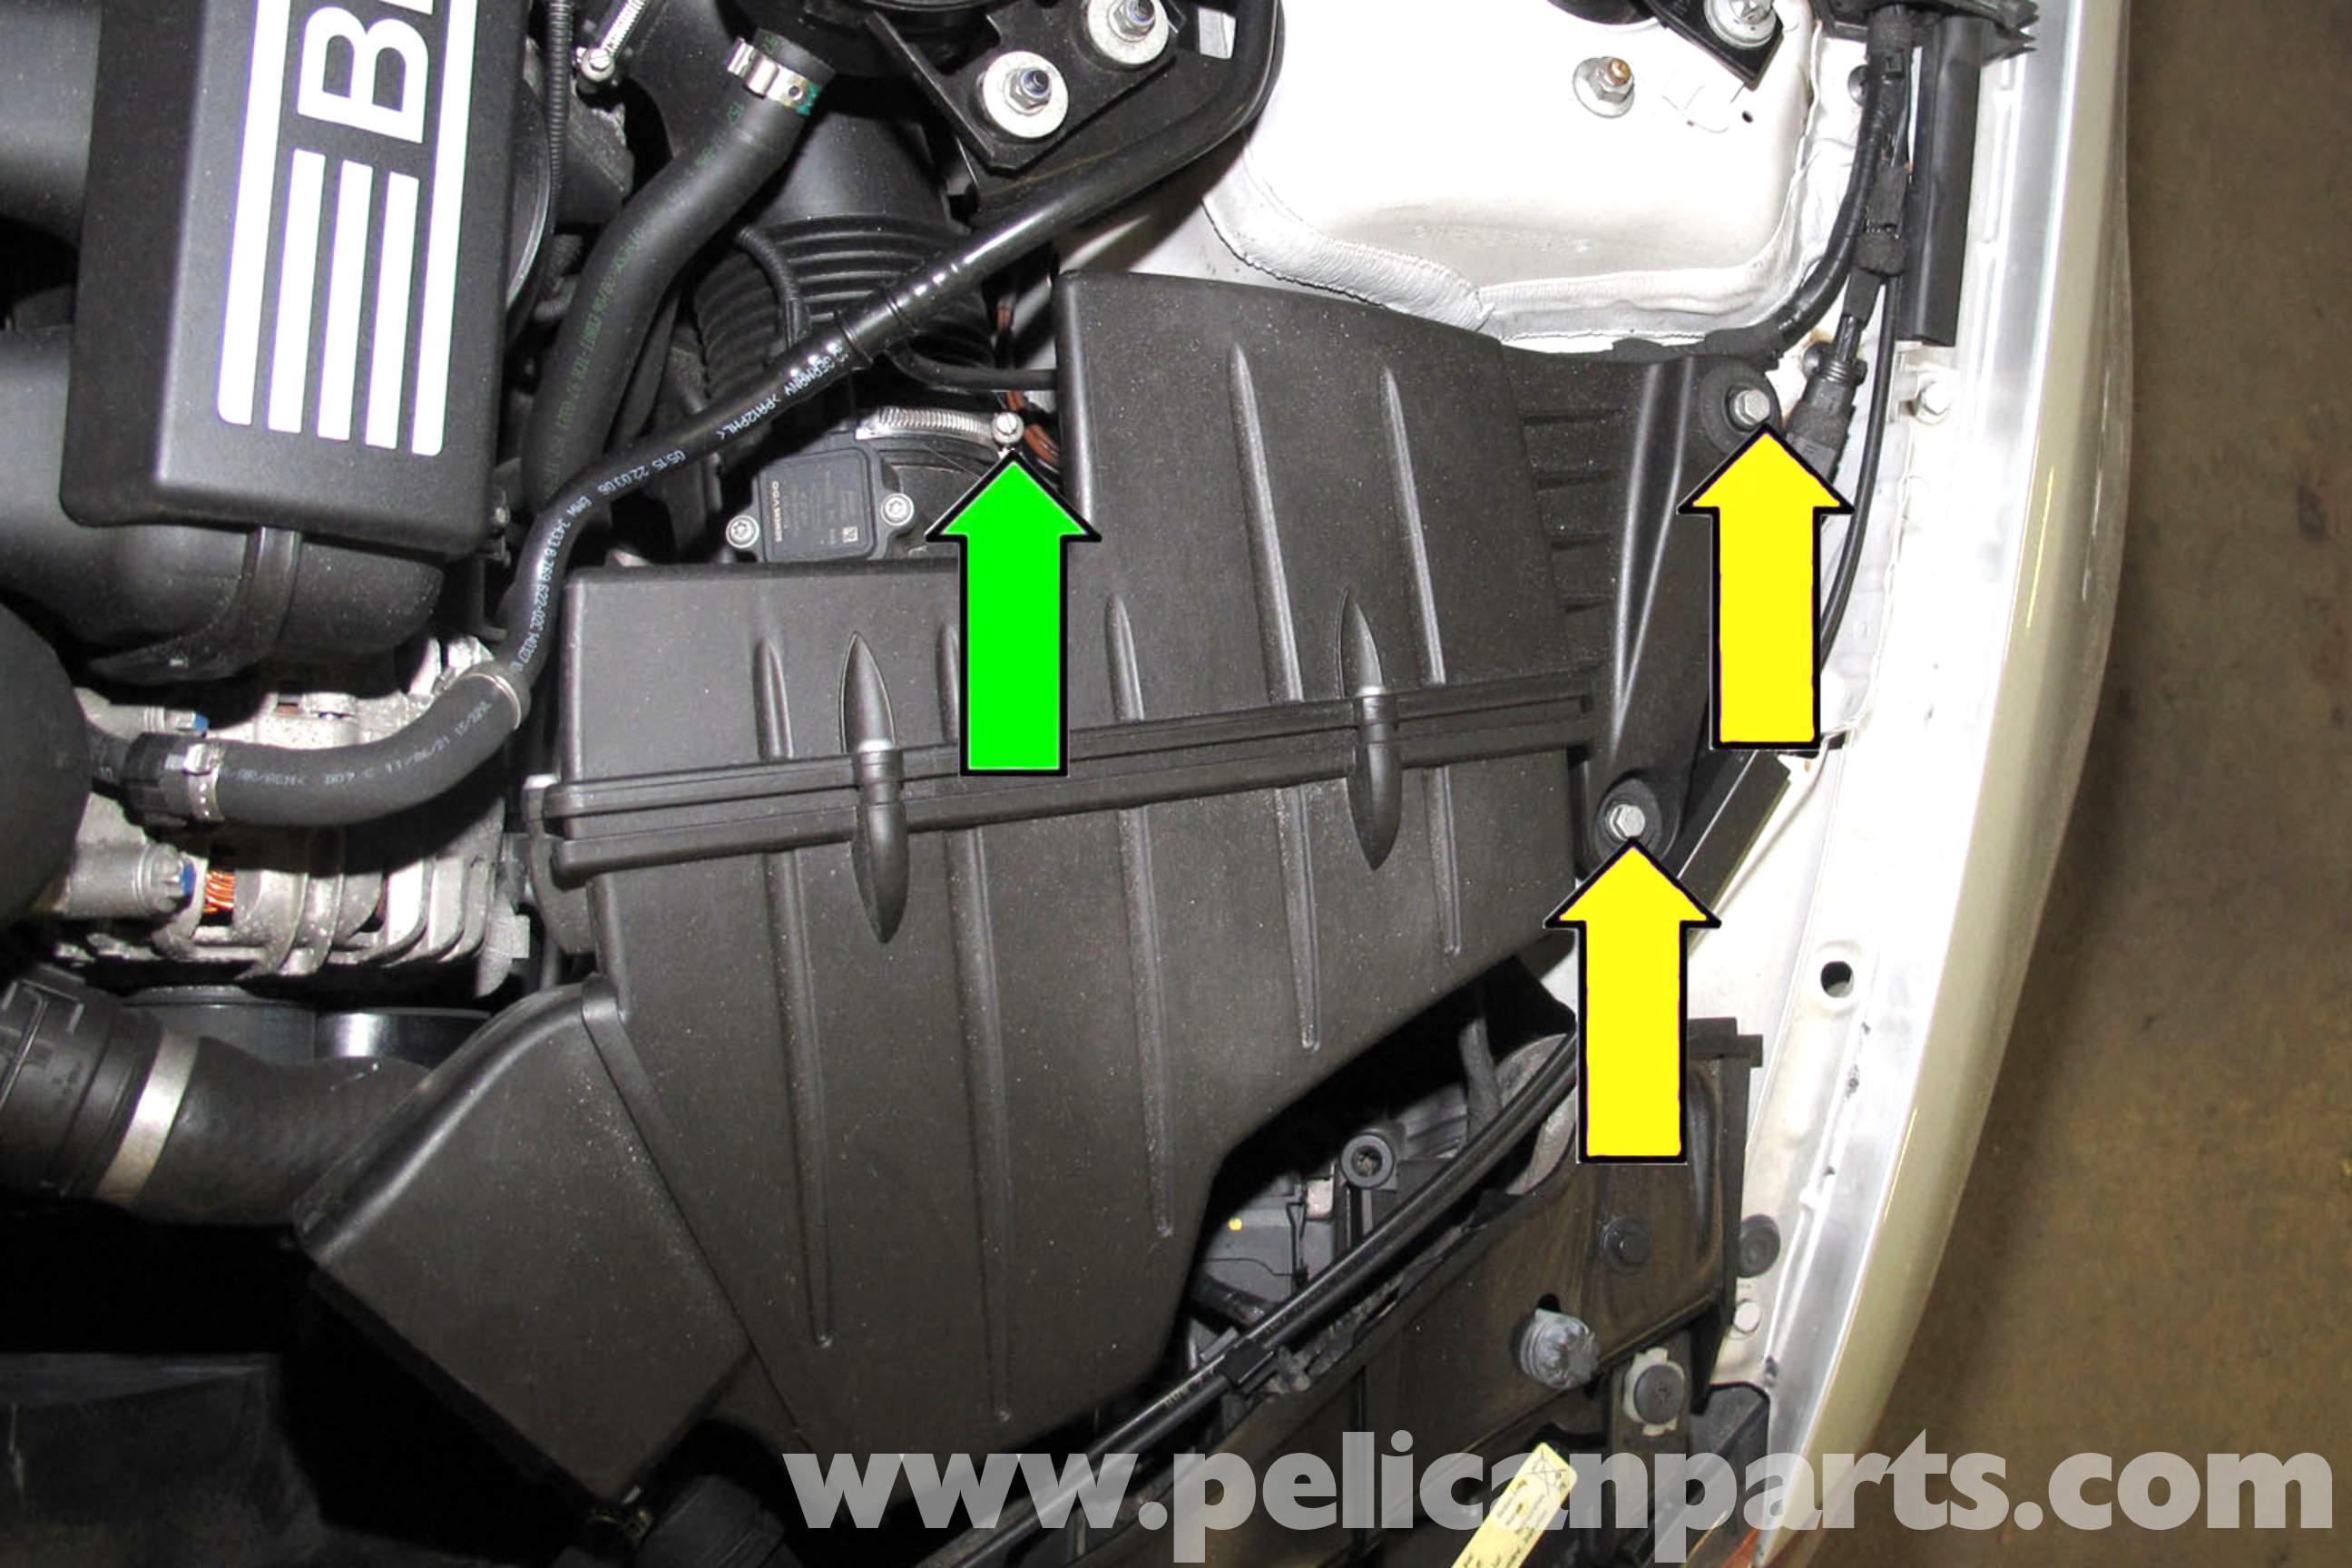 Bmw E90 Throttle Body Replacement E91 E92 E93 Pelican Parts E30 Wiring Harness Removal Large Image Extra